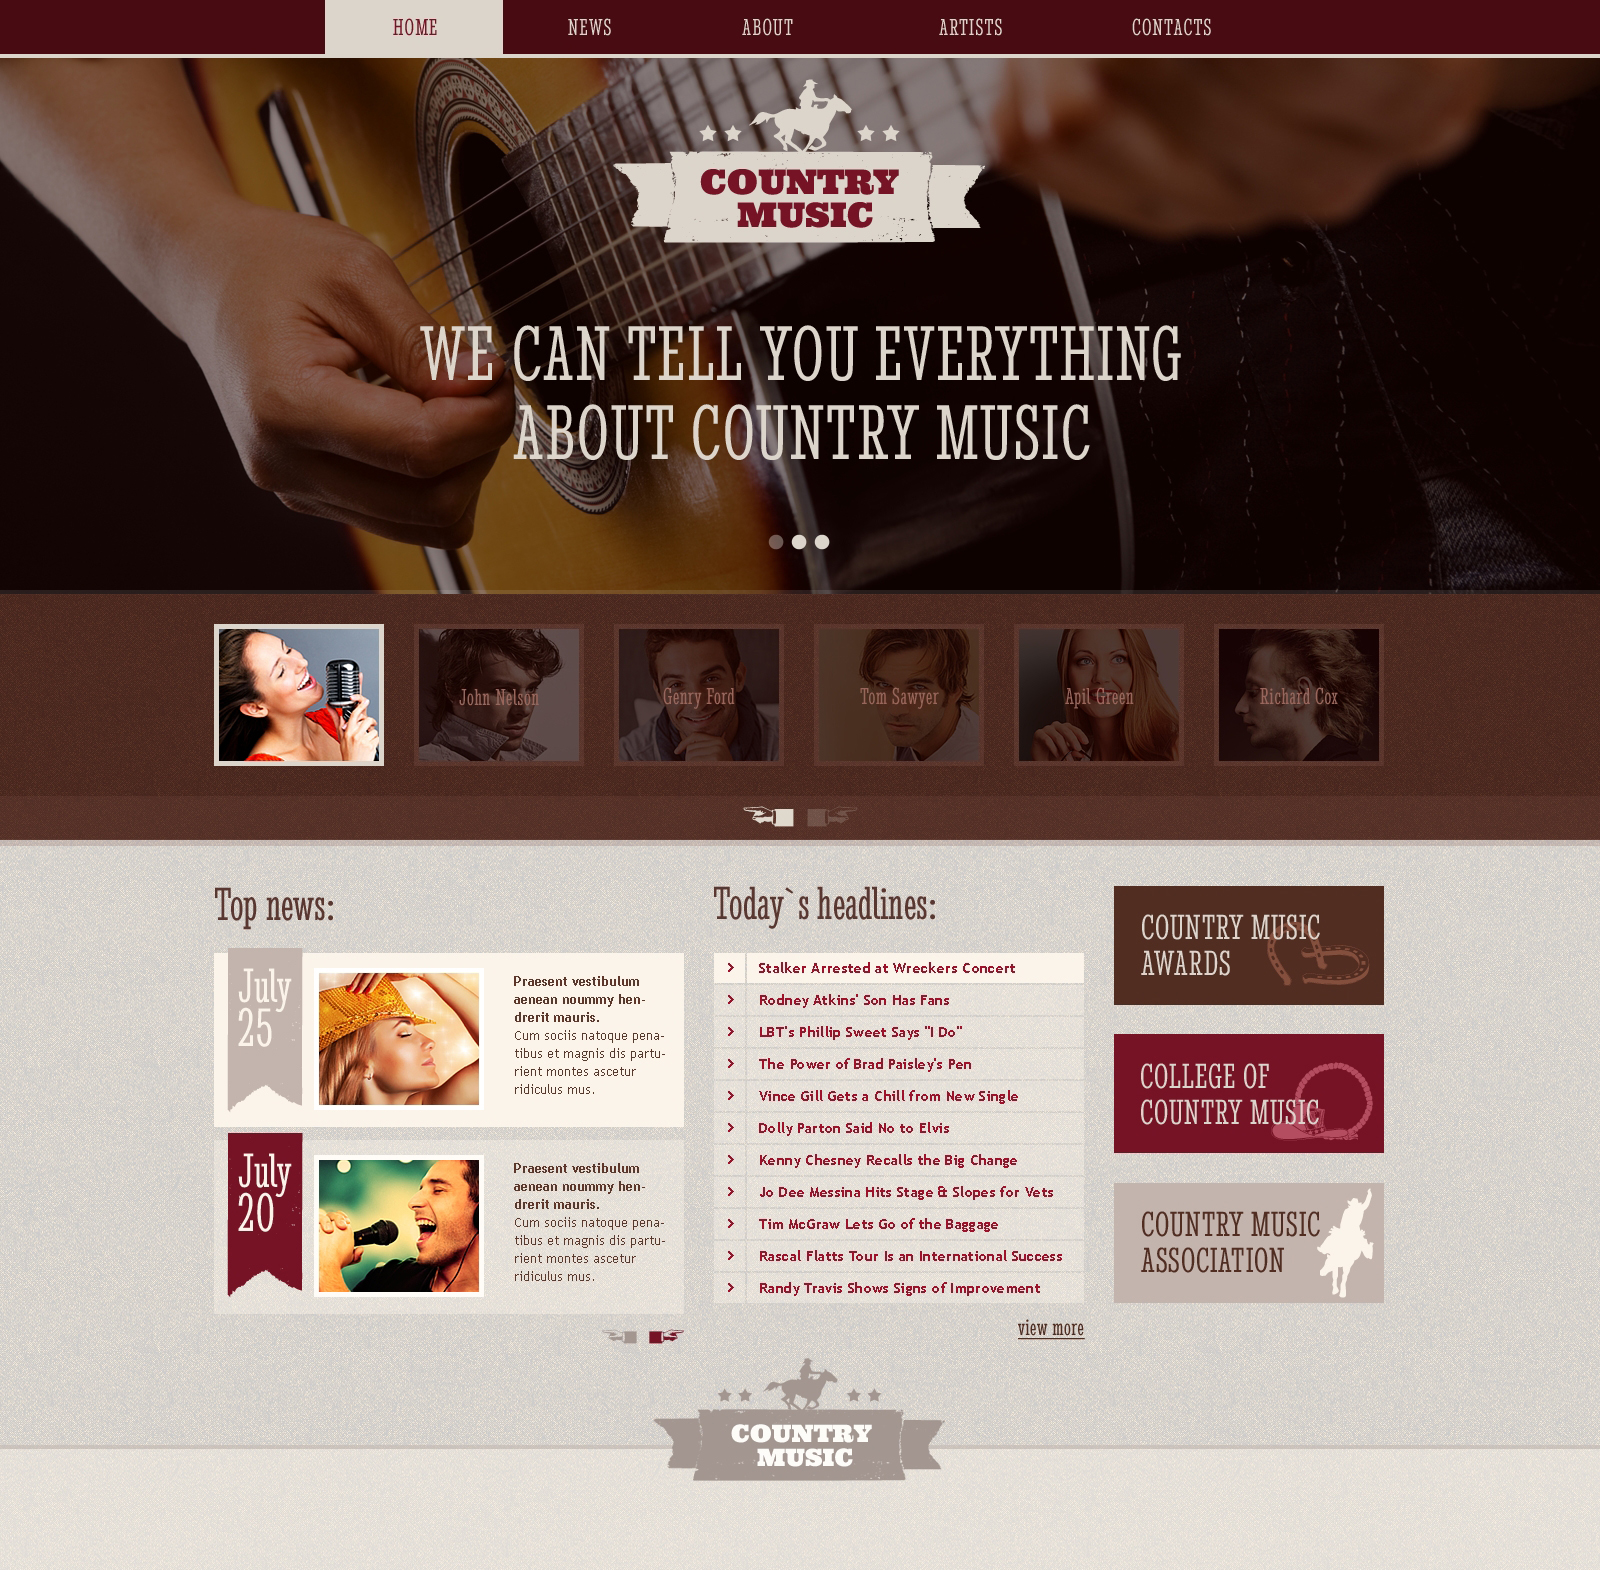 Plantilla Web Responsive para Sitio de Bloges de música #46515 - captura de pantalla